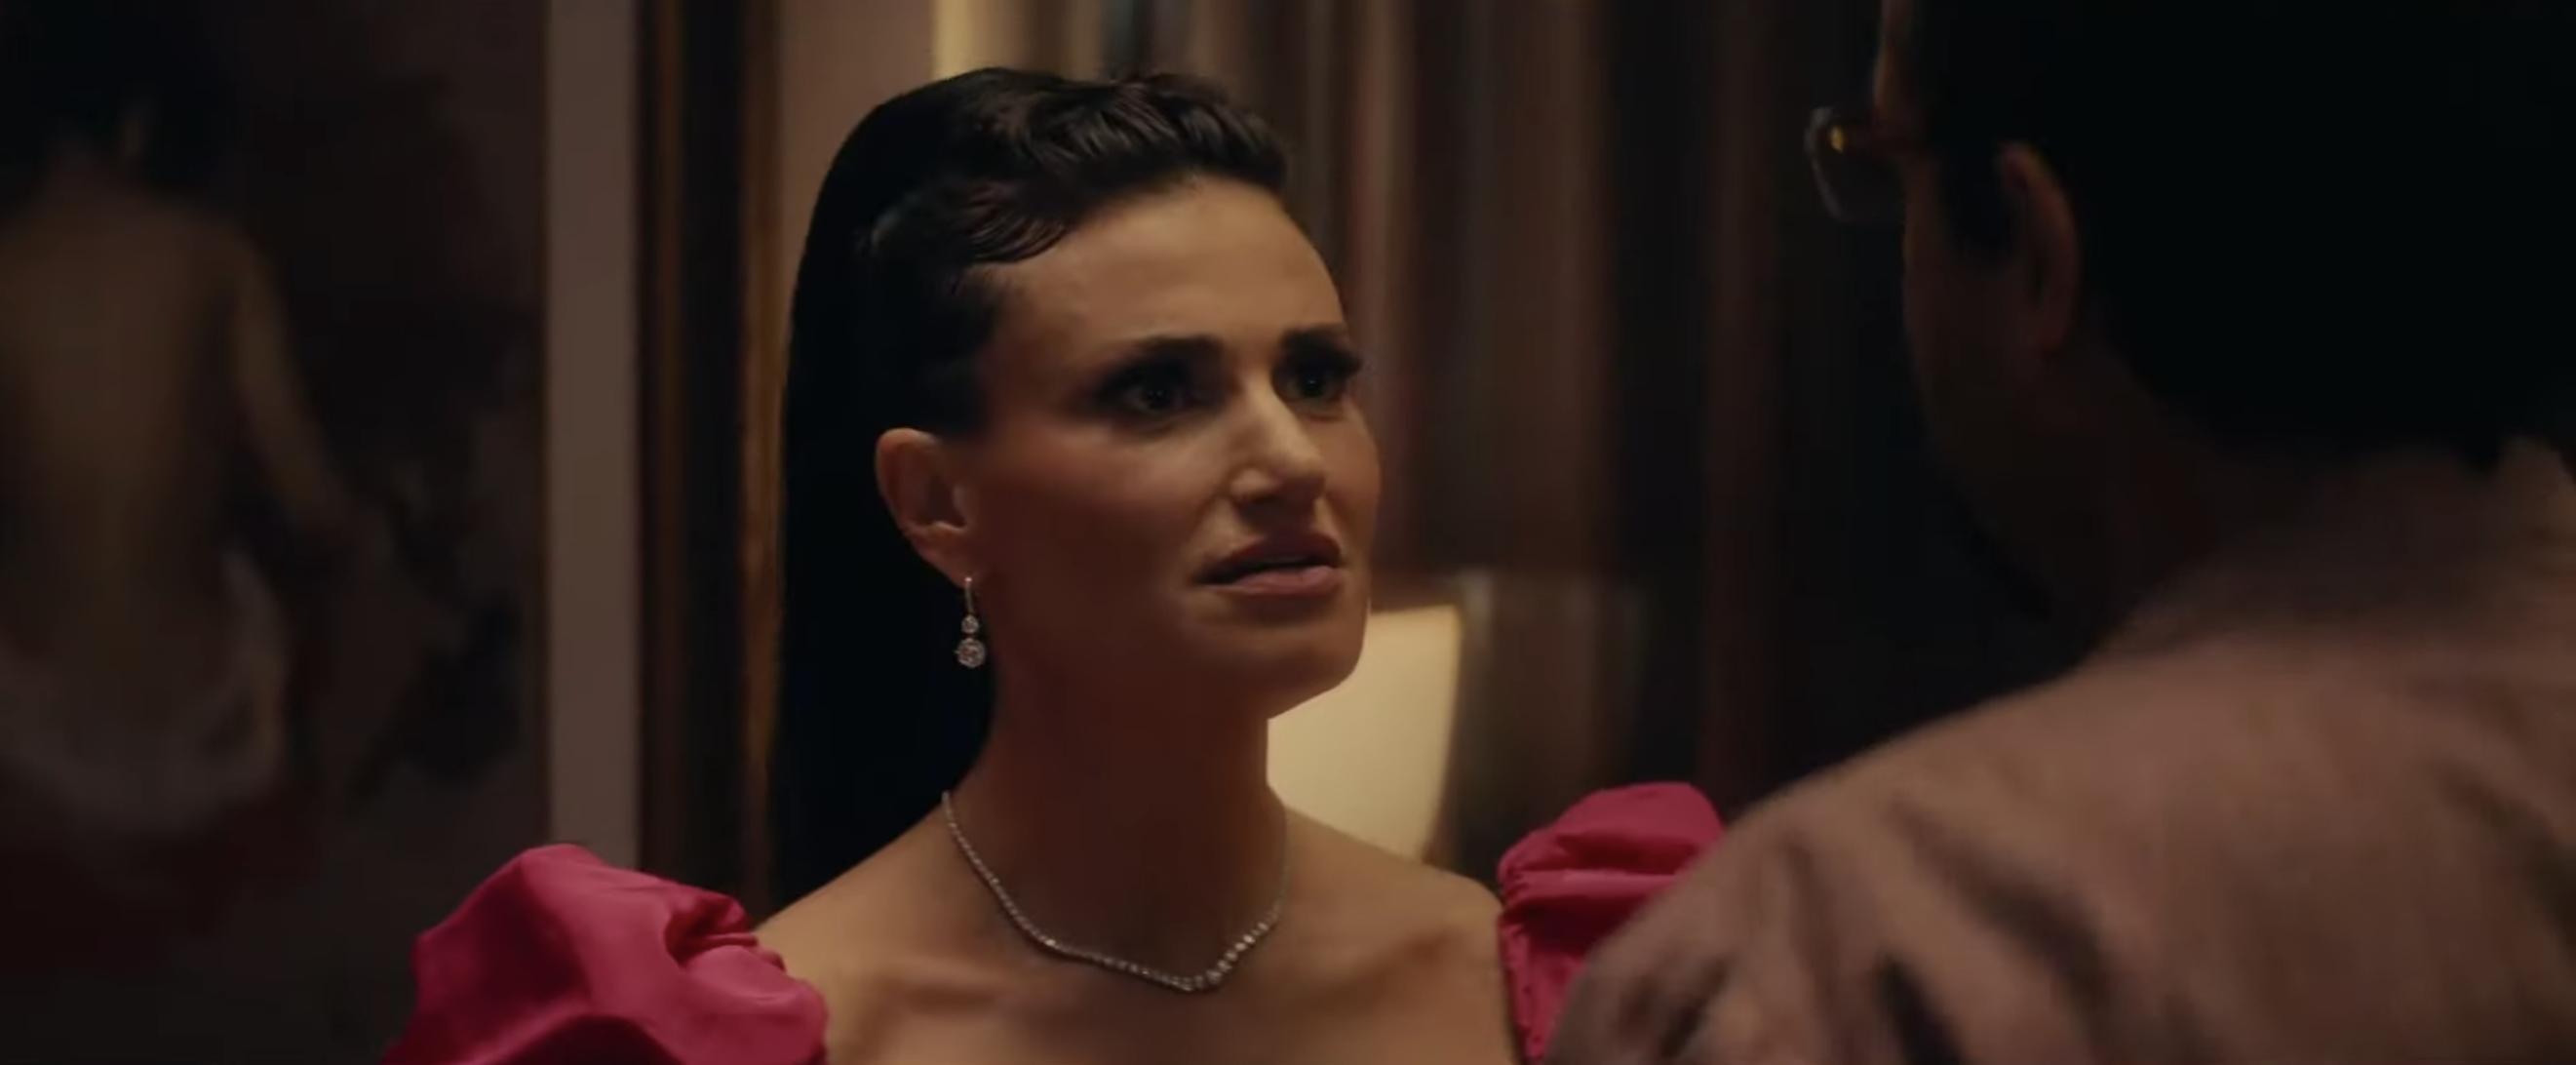 "Idina Menzel in ""Uncut Gems"" (Promotional still)"